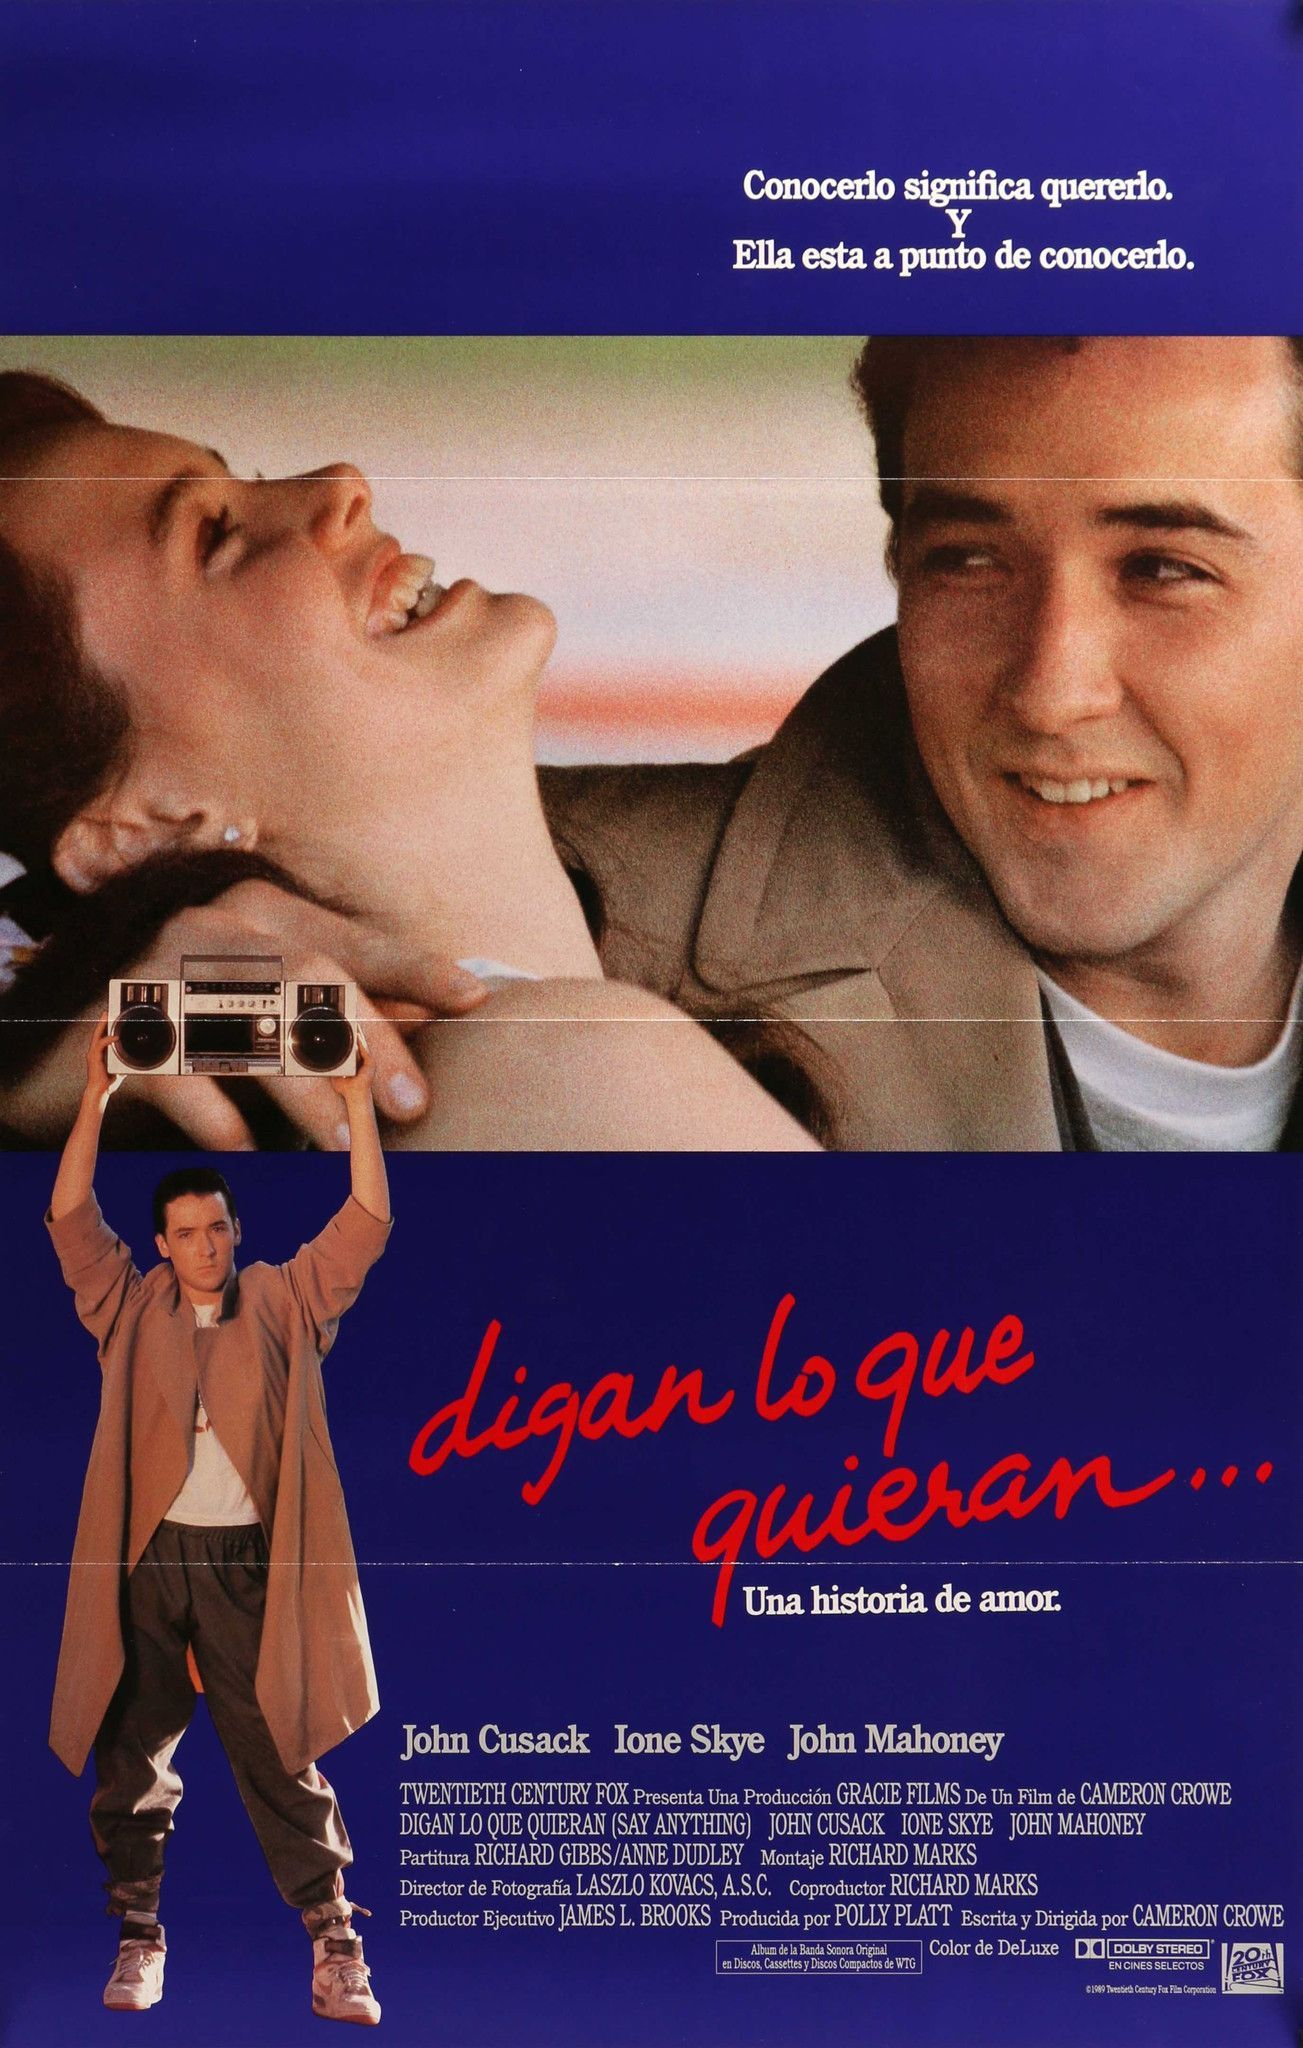 Say Anything 1989 John Cusack Movies Movie Posters 80s Movies